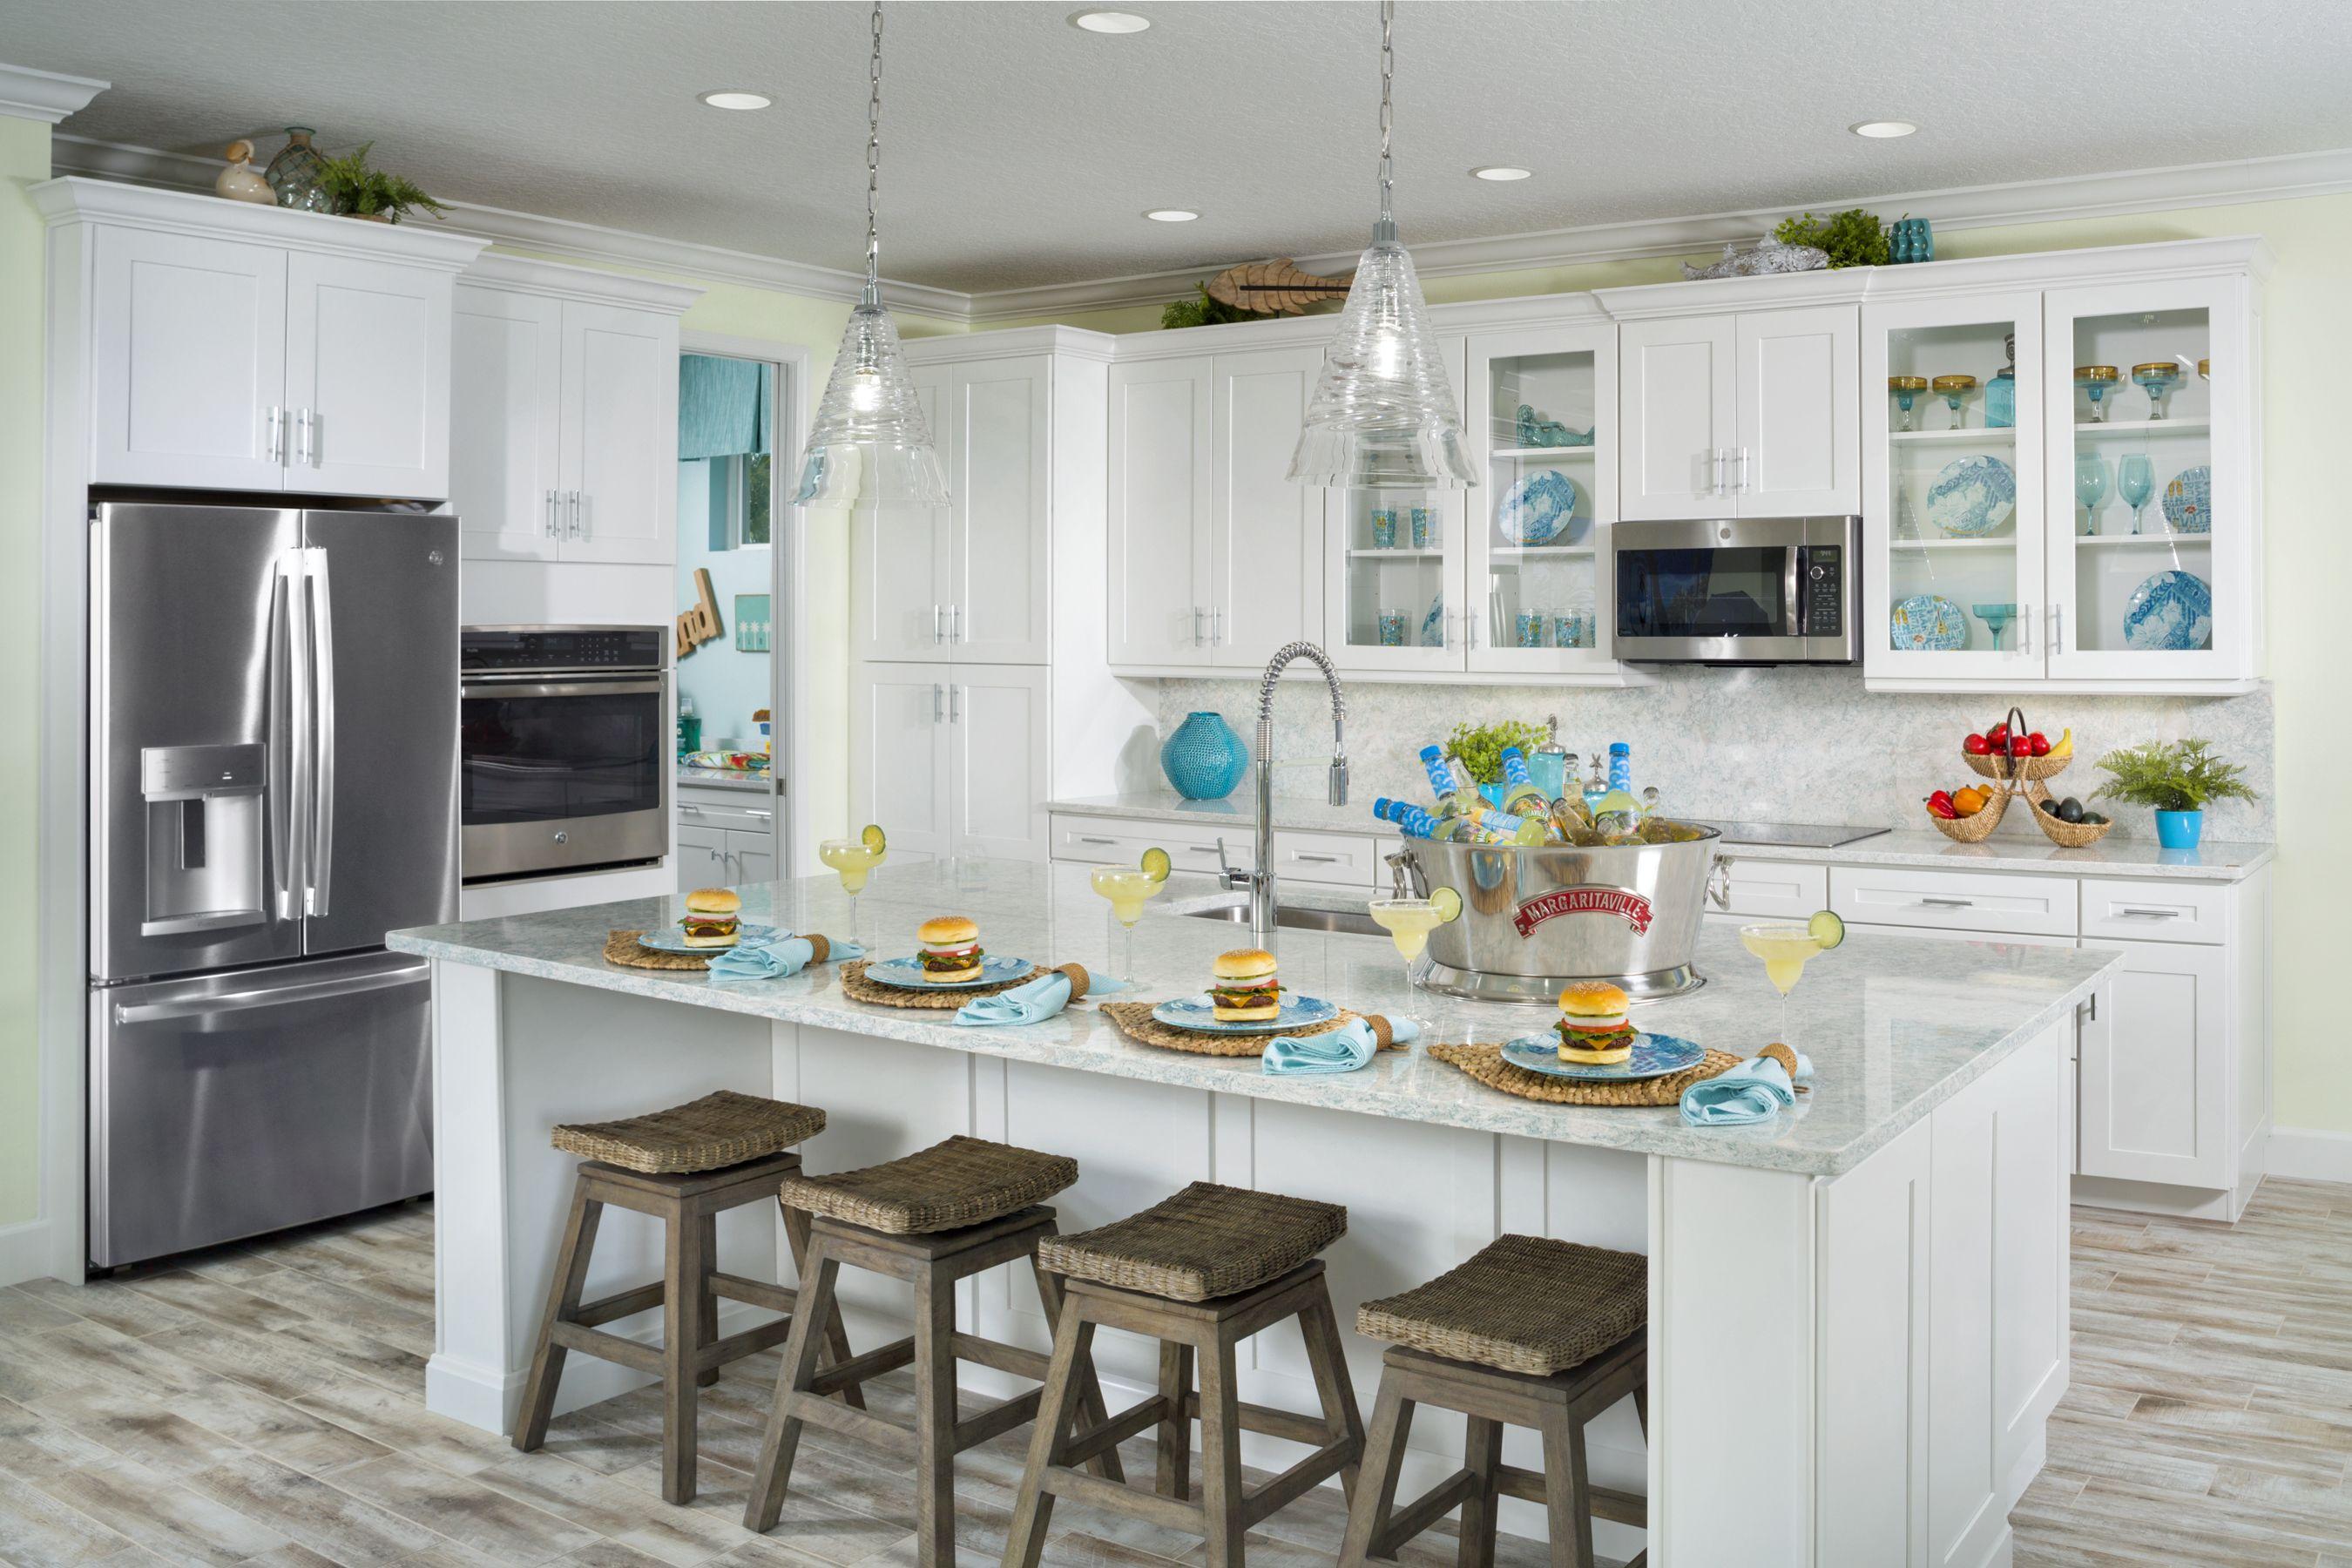 Aruba Model At Latitude Margaritaville Daytona Beach Minto Communities Lake House Kitchen Home Bar Cabinet Home Kitchens